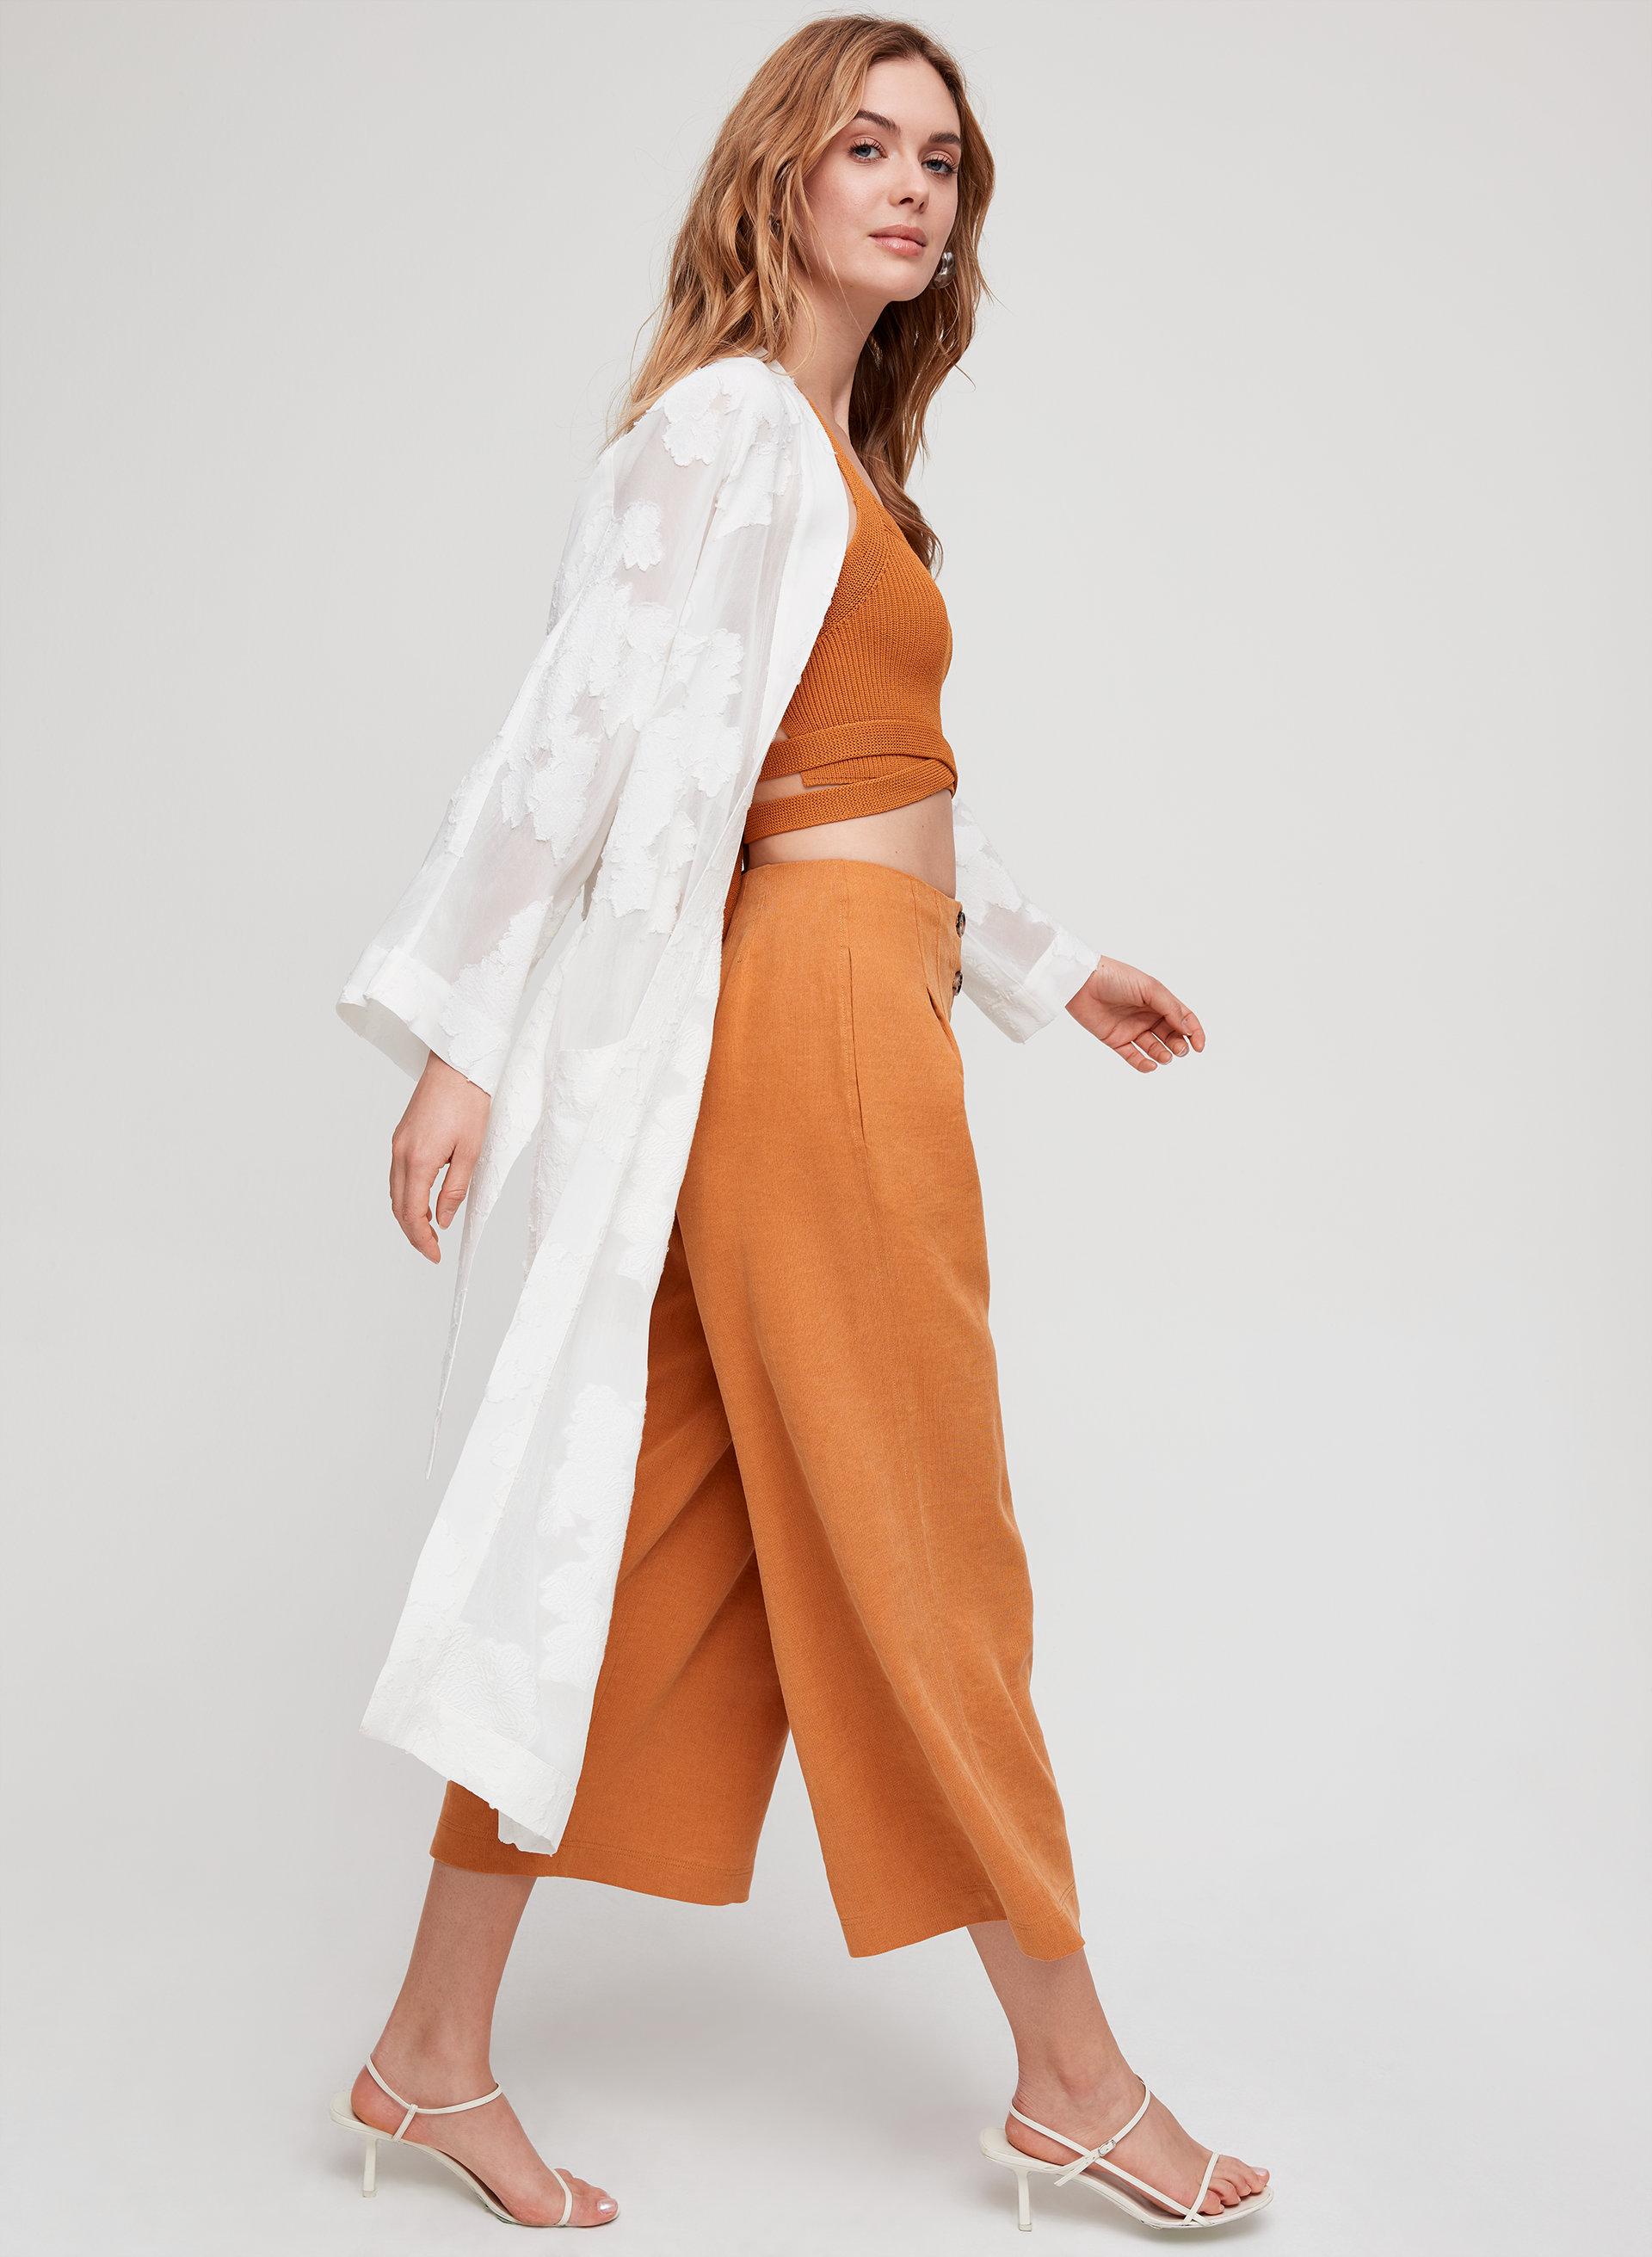 004706439 durante jacket Long jacquard kimono